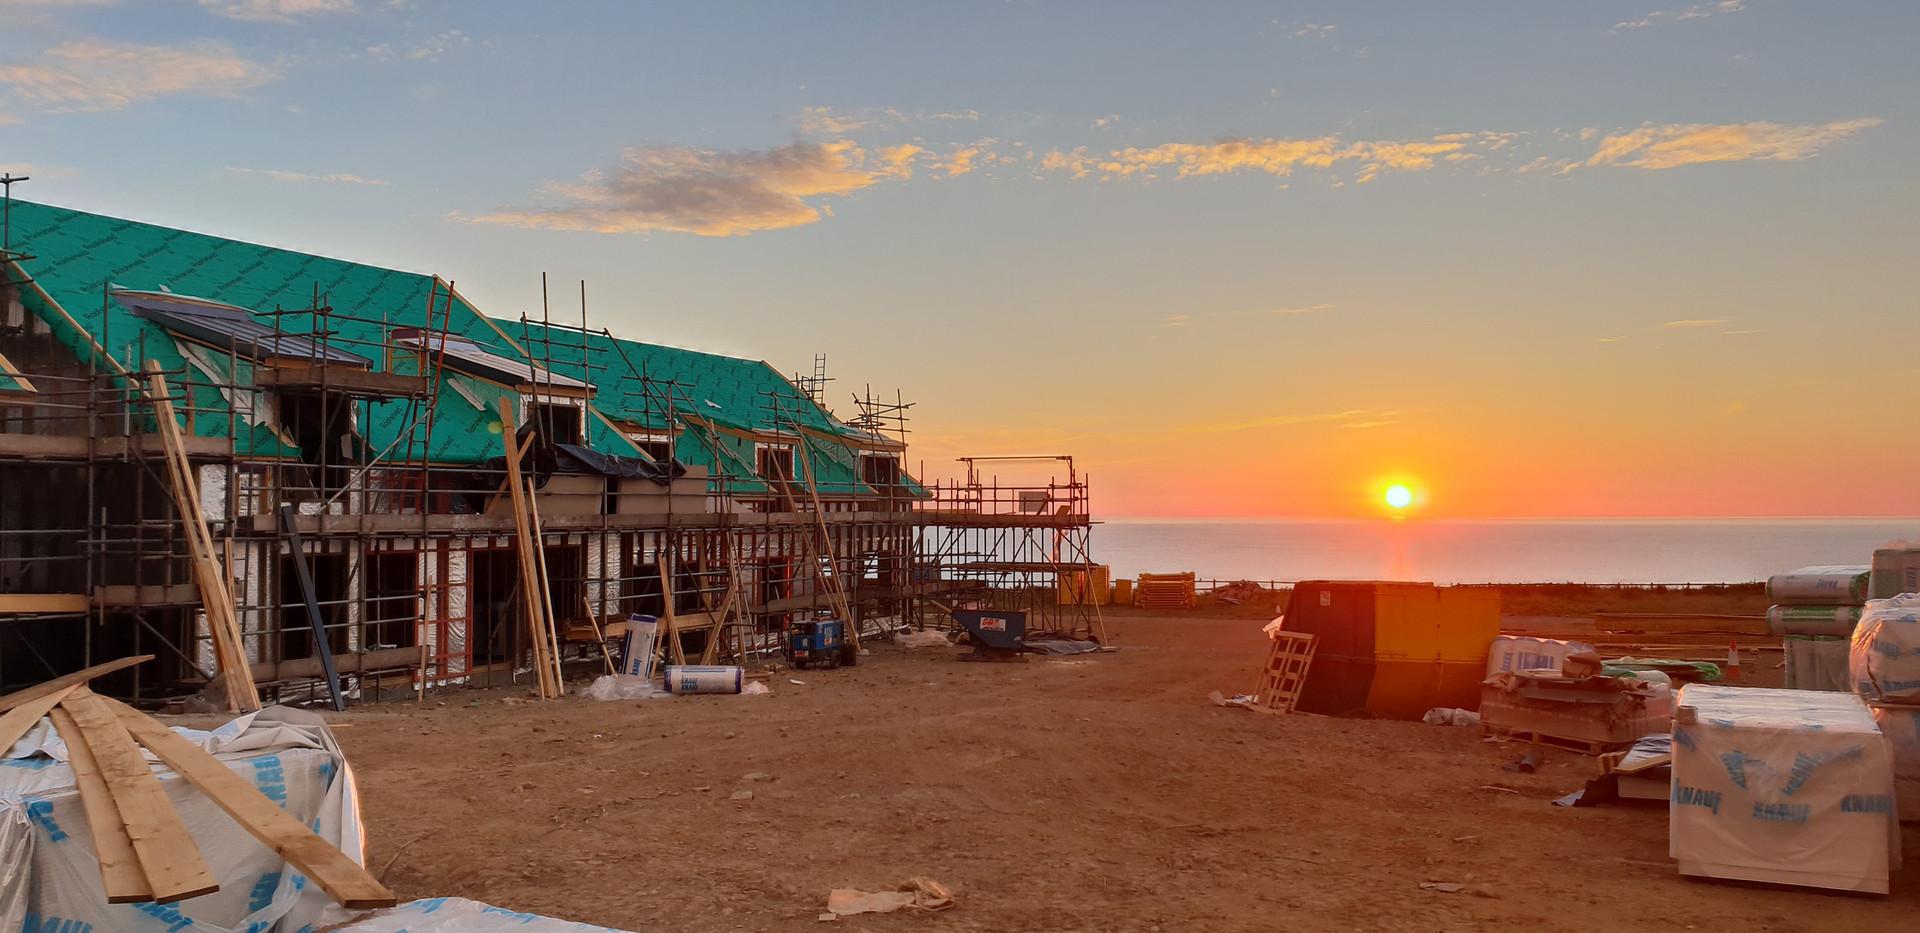 Llyn Peninsula Construction Photo